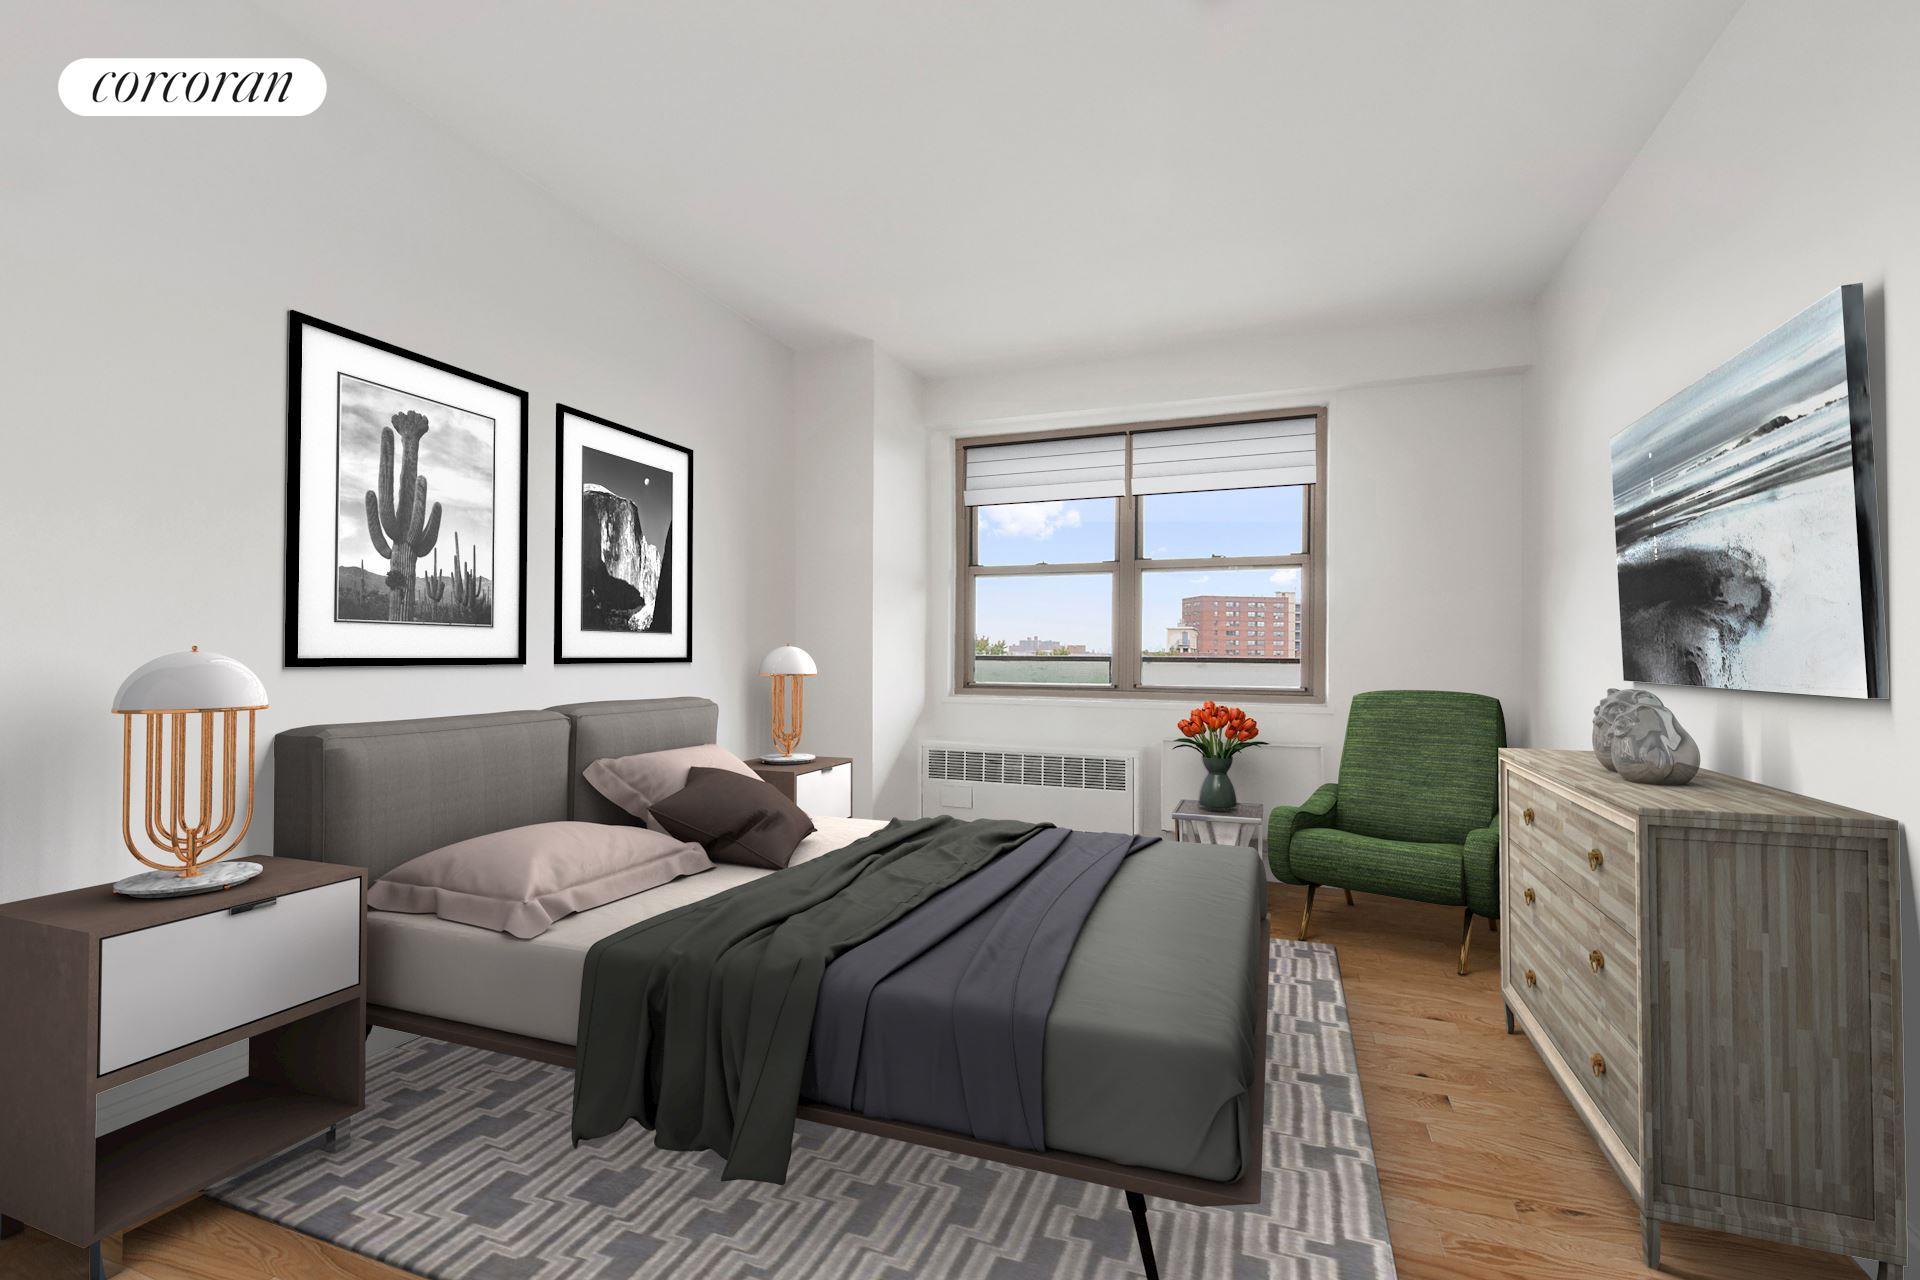 Gateway Elton Apartments Floor Plans: Corcoran, 400 Cozine Avenue, Apt. 1J, Brooklyn Real Estate